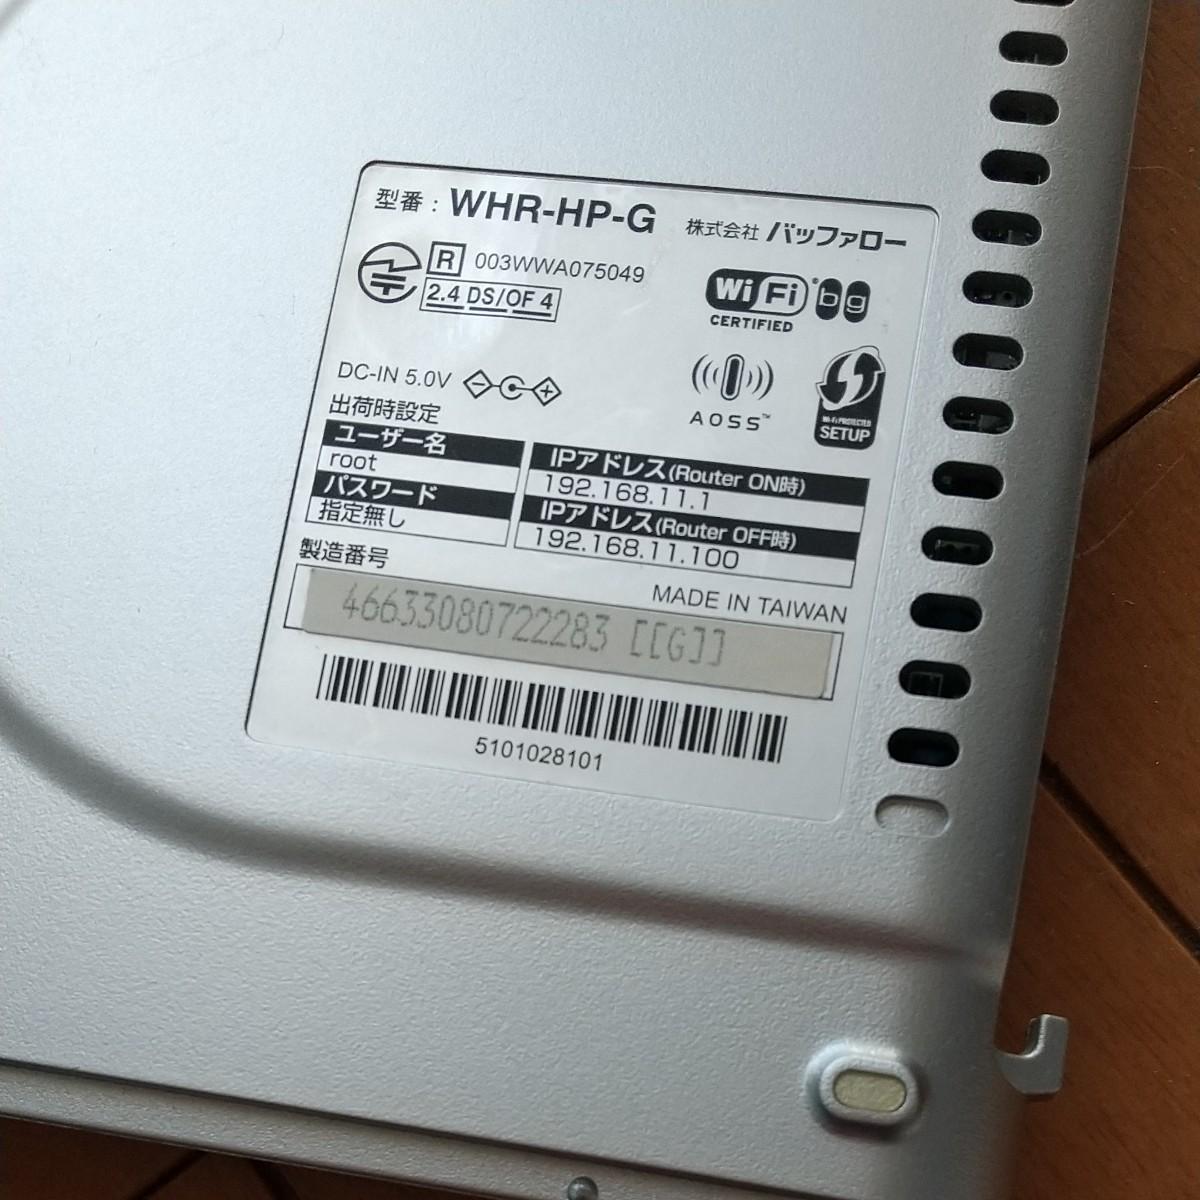 BUFFALO 無線LANルーター WHR-HP-G